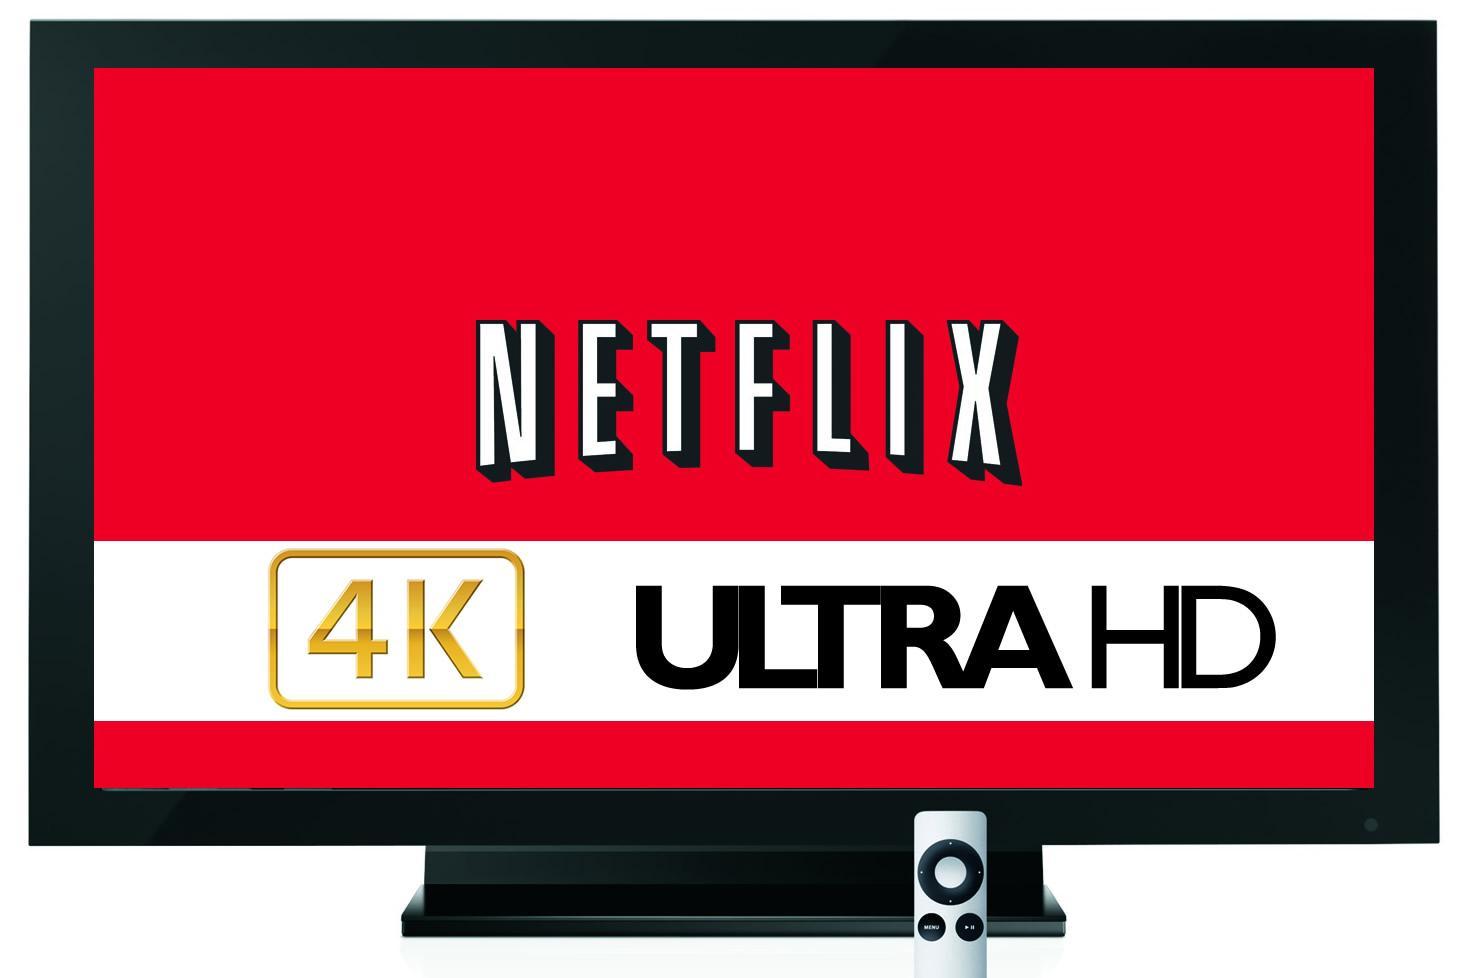 netflix-4k-ultra-hd1.jpg